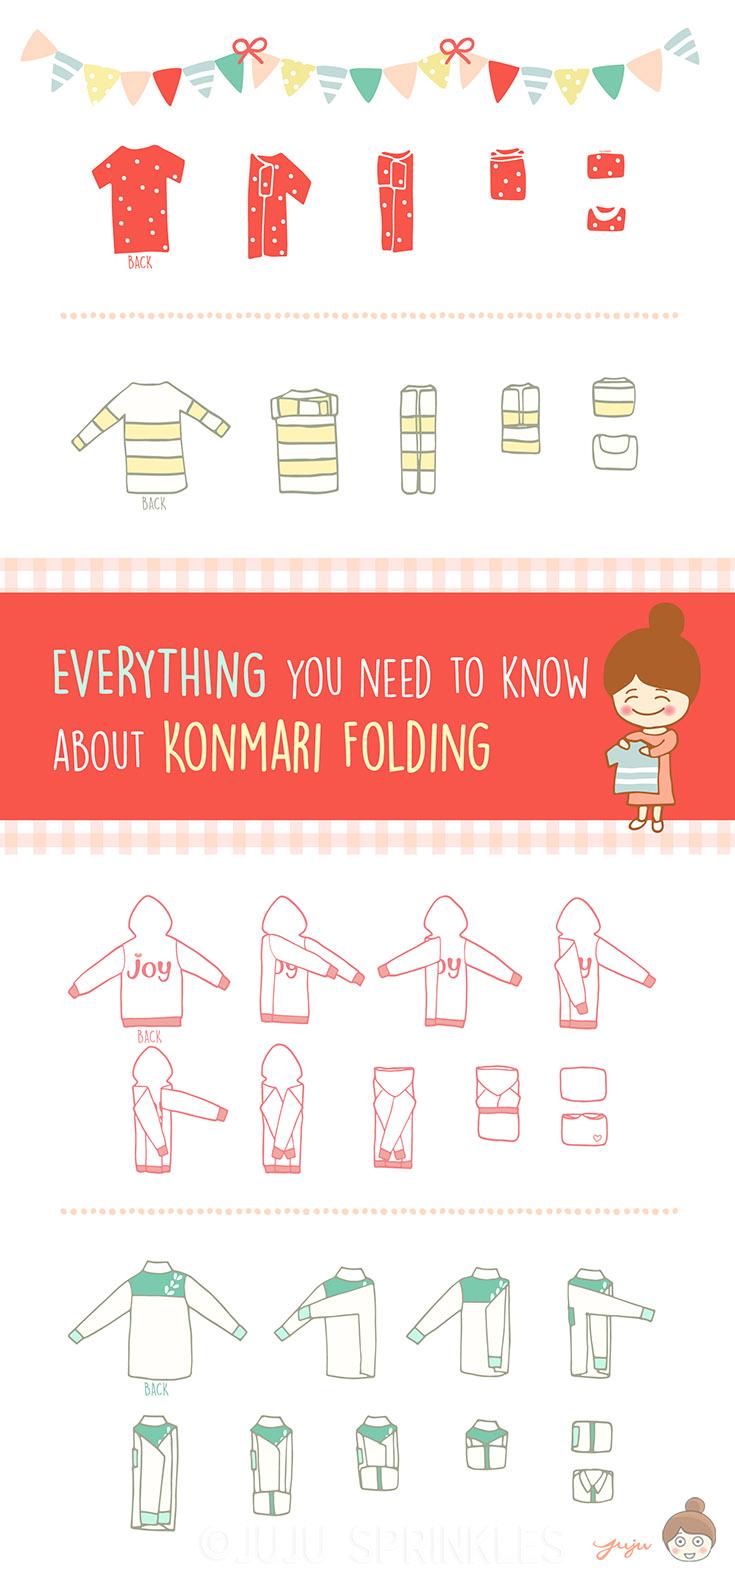 Konmari Folding 85x11 FinalB